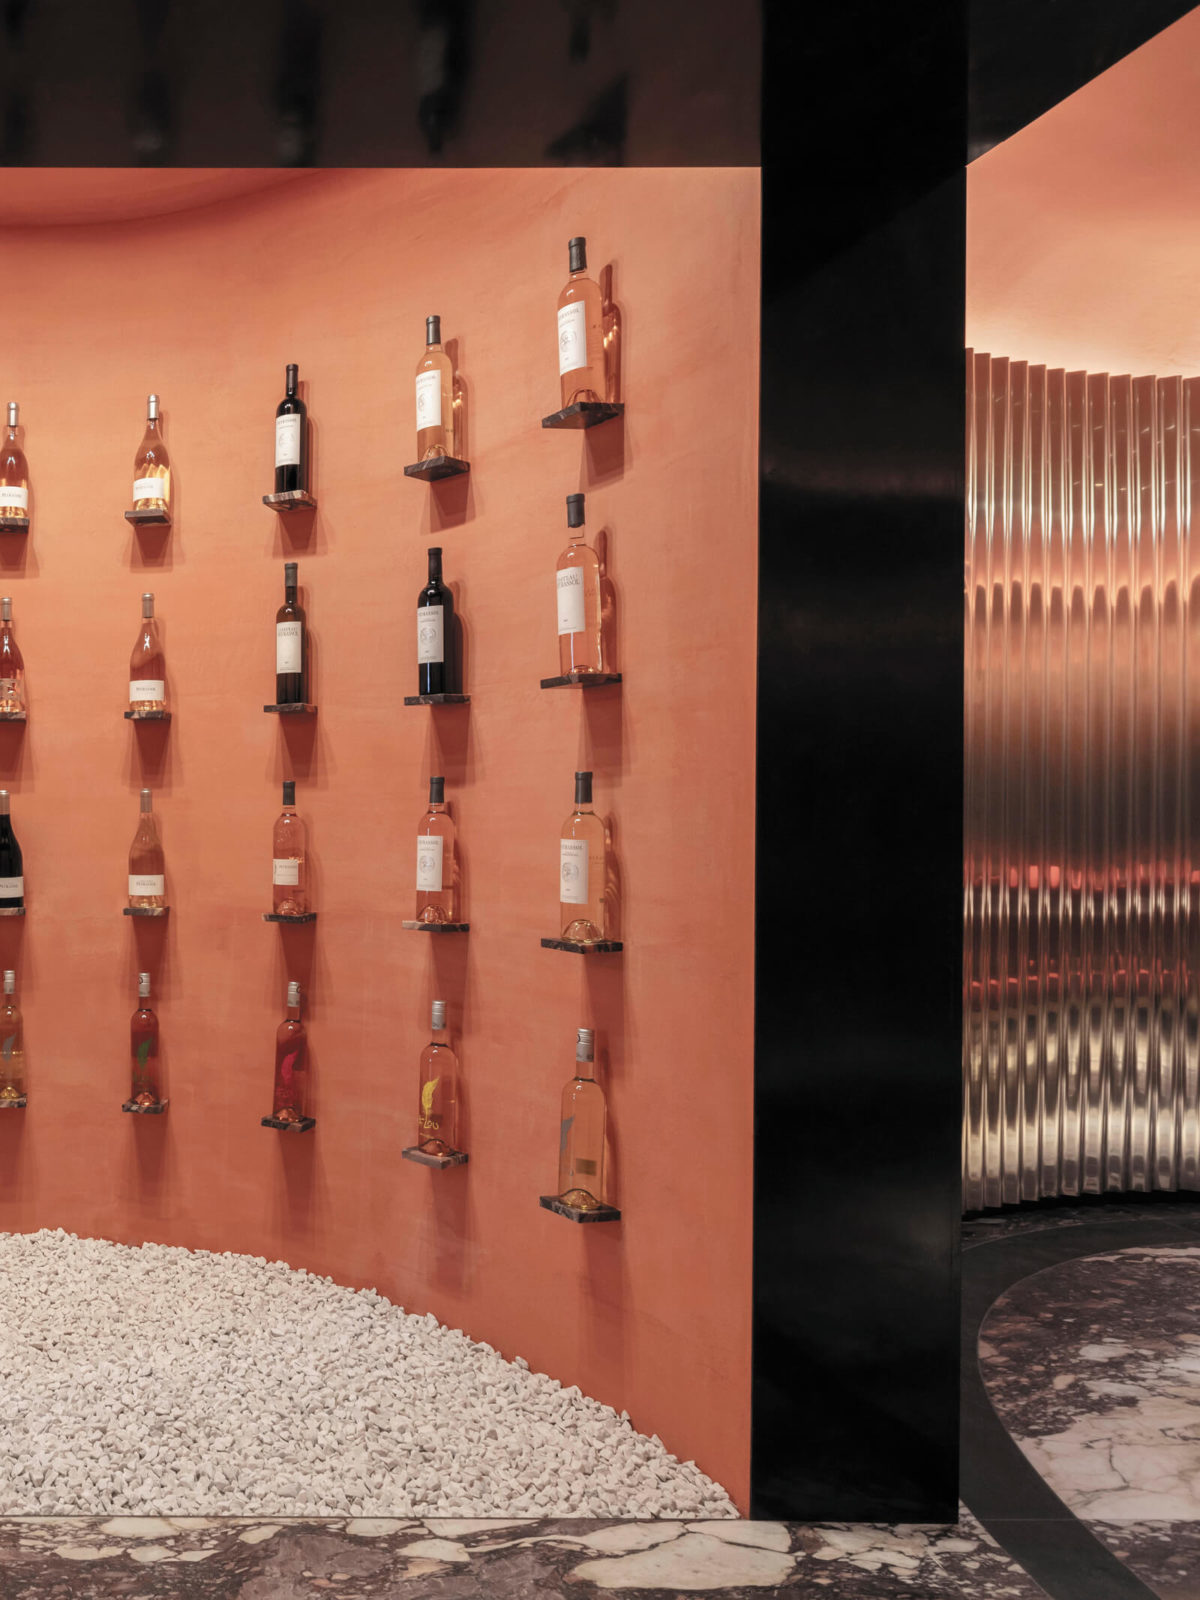 Showroom des Vignobles Austruy